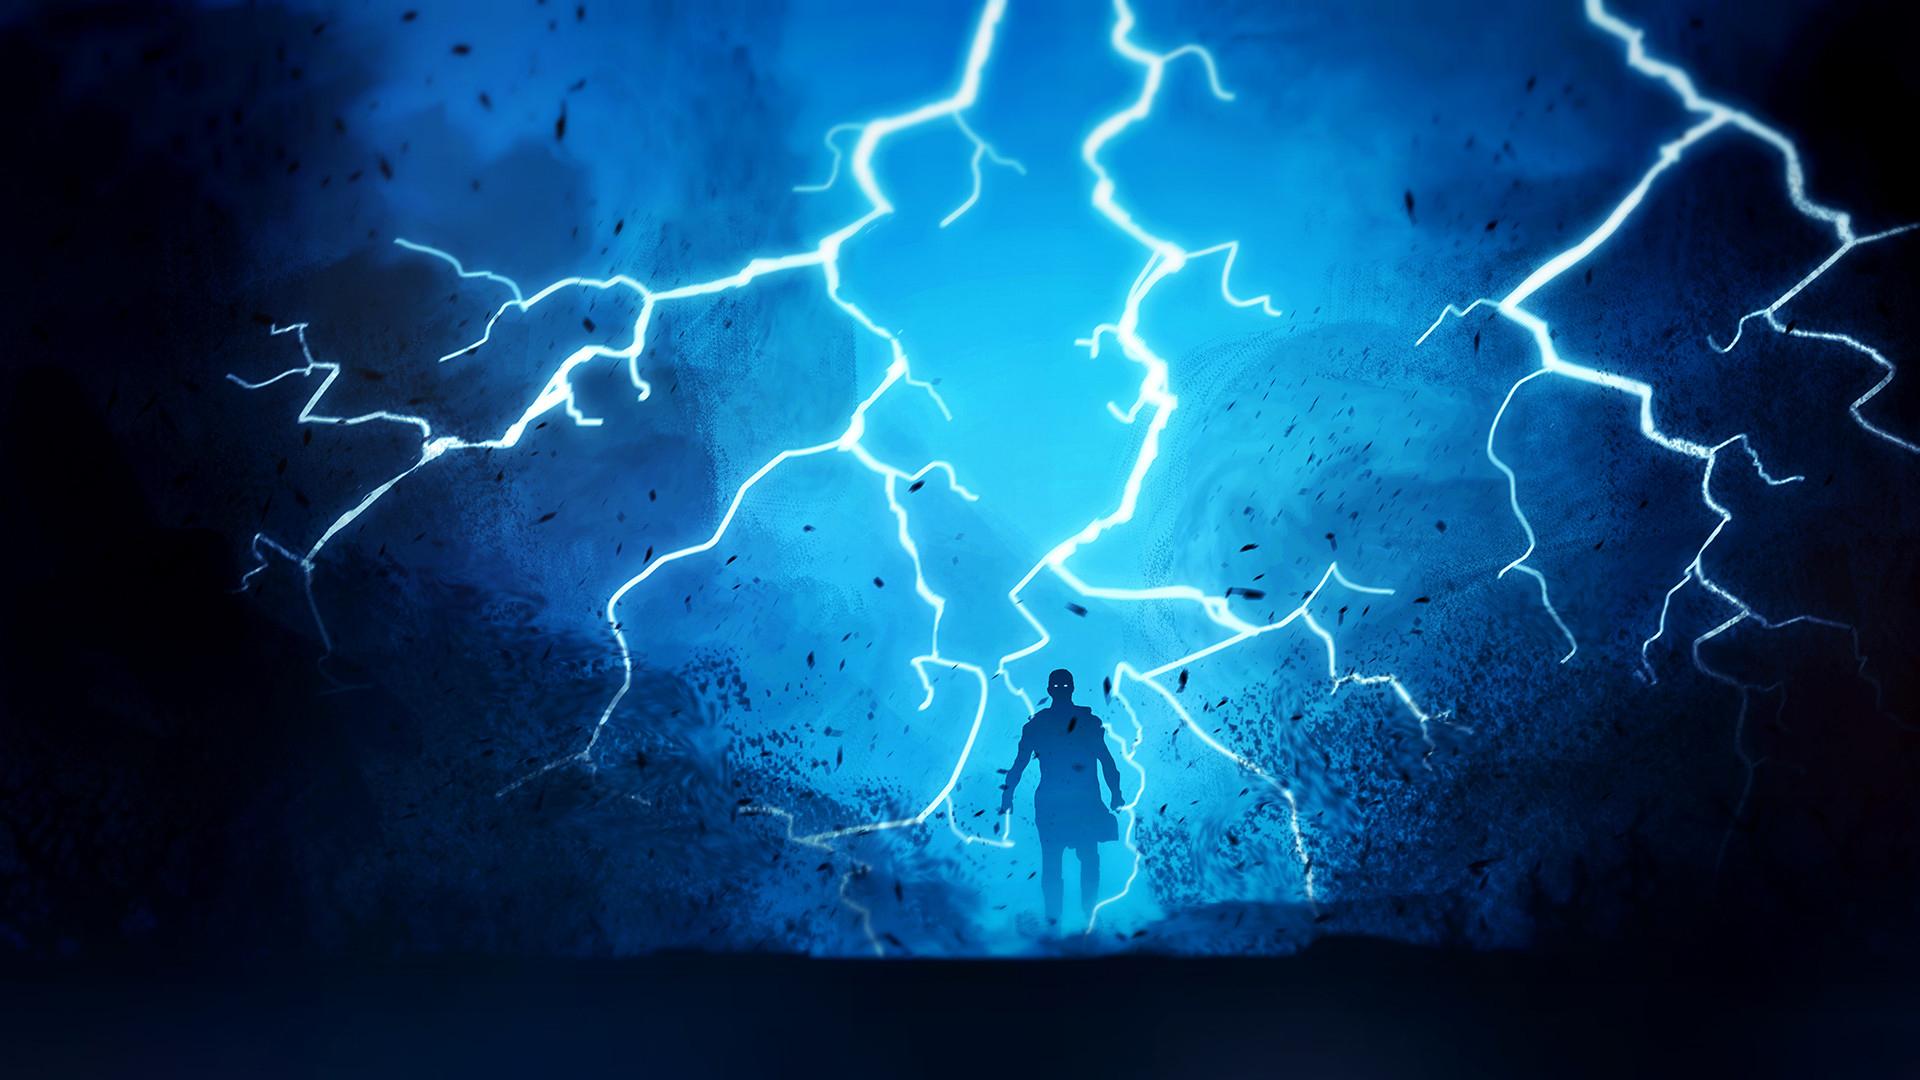 Warrior Fantasy Lightning HD Artist 4k Wallpapers Images